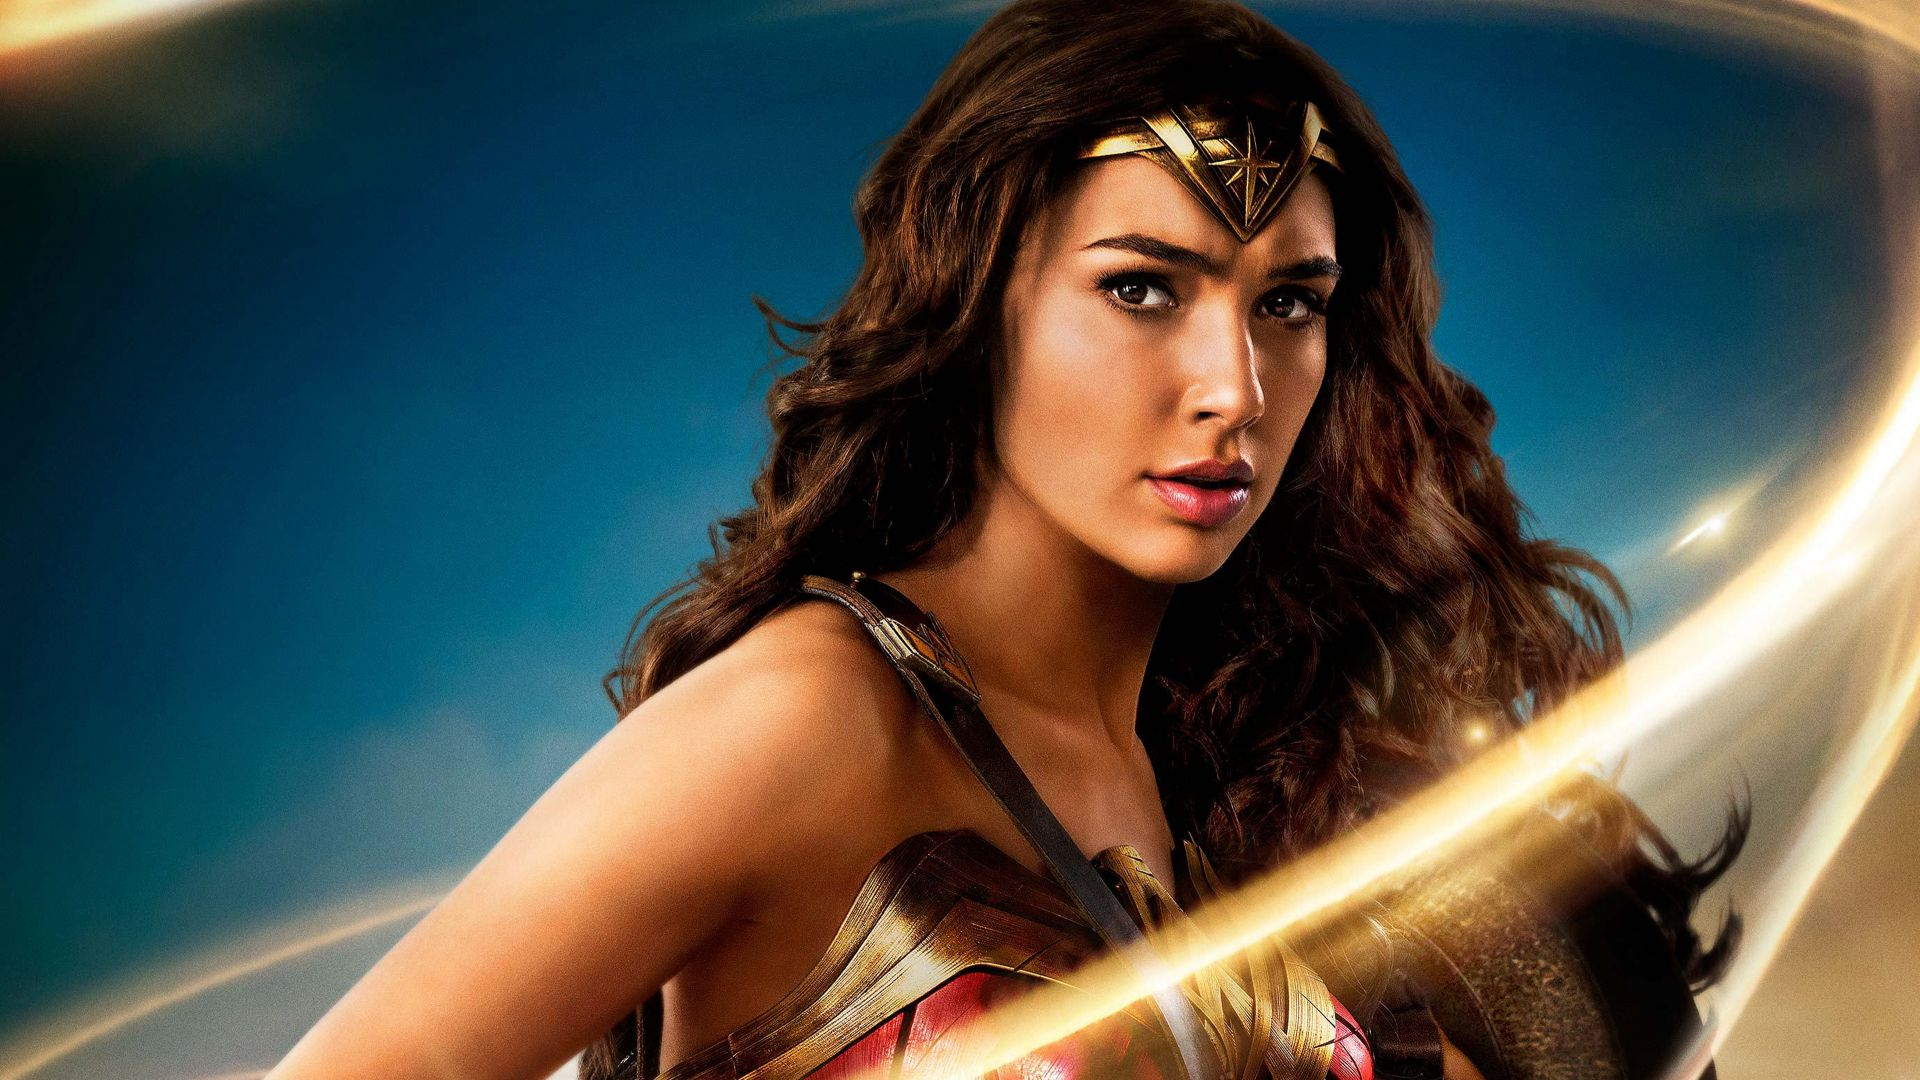 Desktop Wallpaper Gal Gadot Wonder Woman Movie New Poster 4k Hd